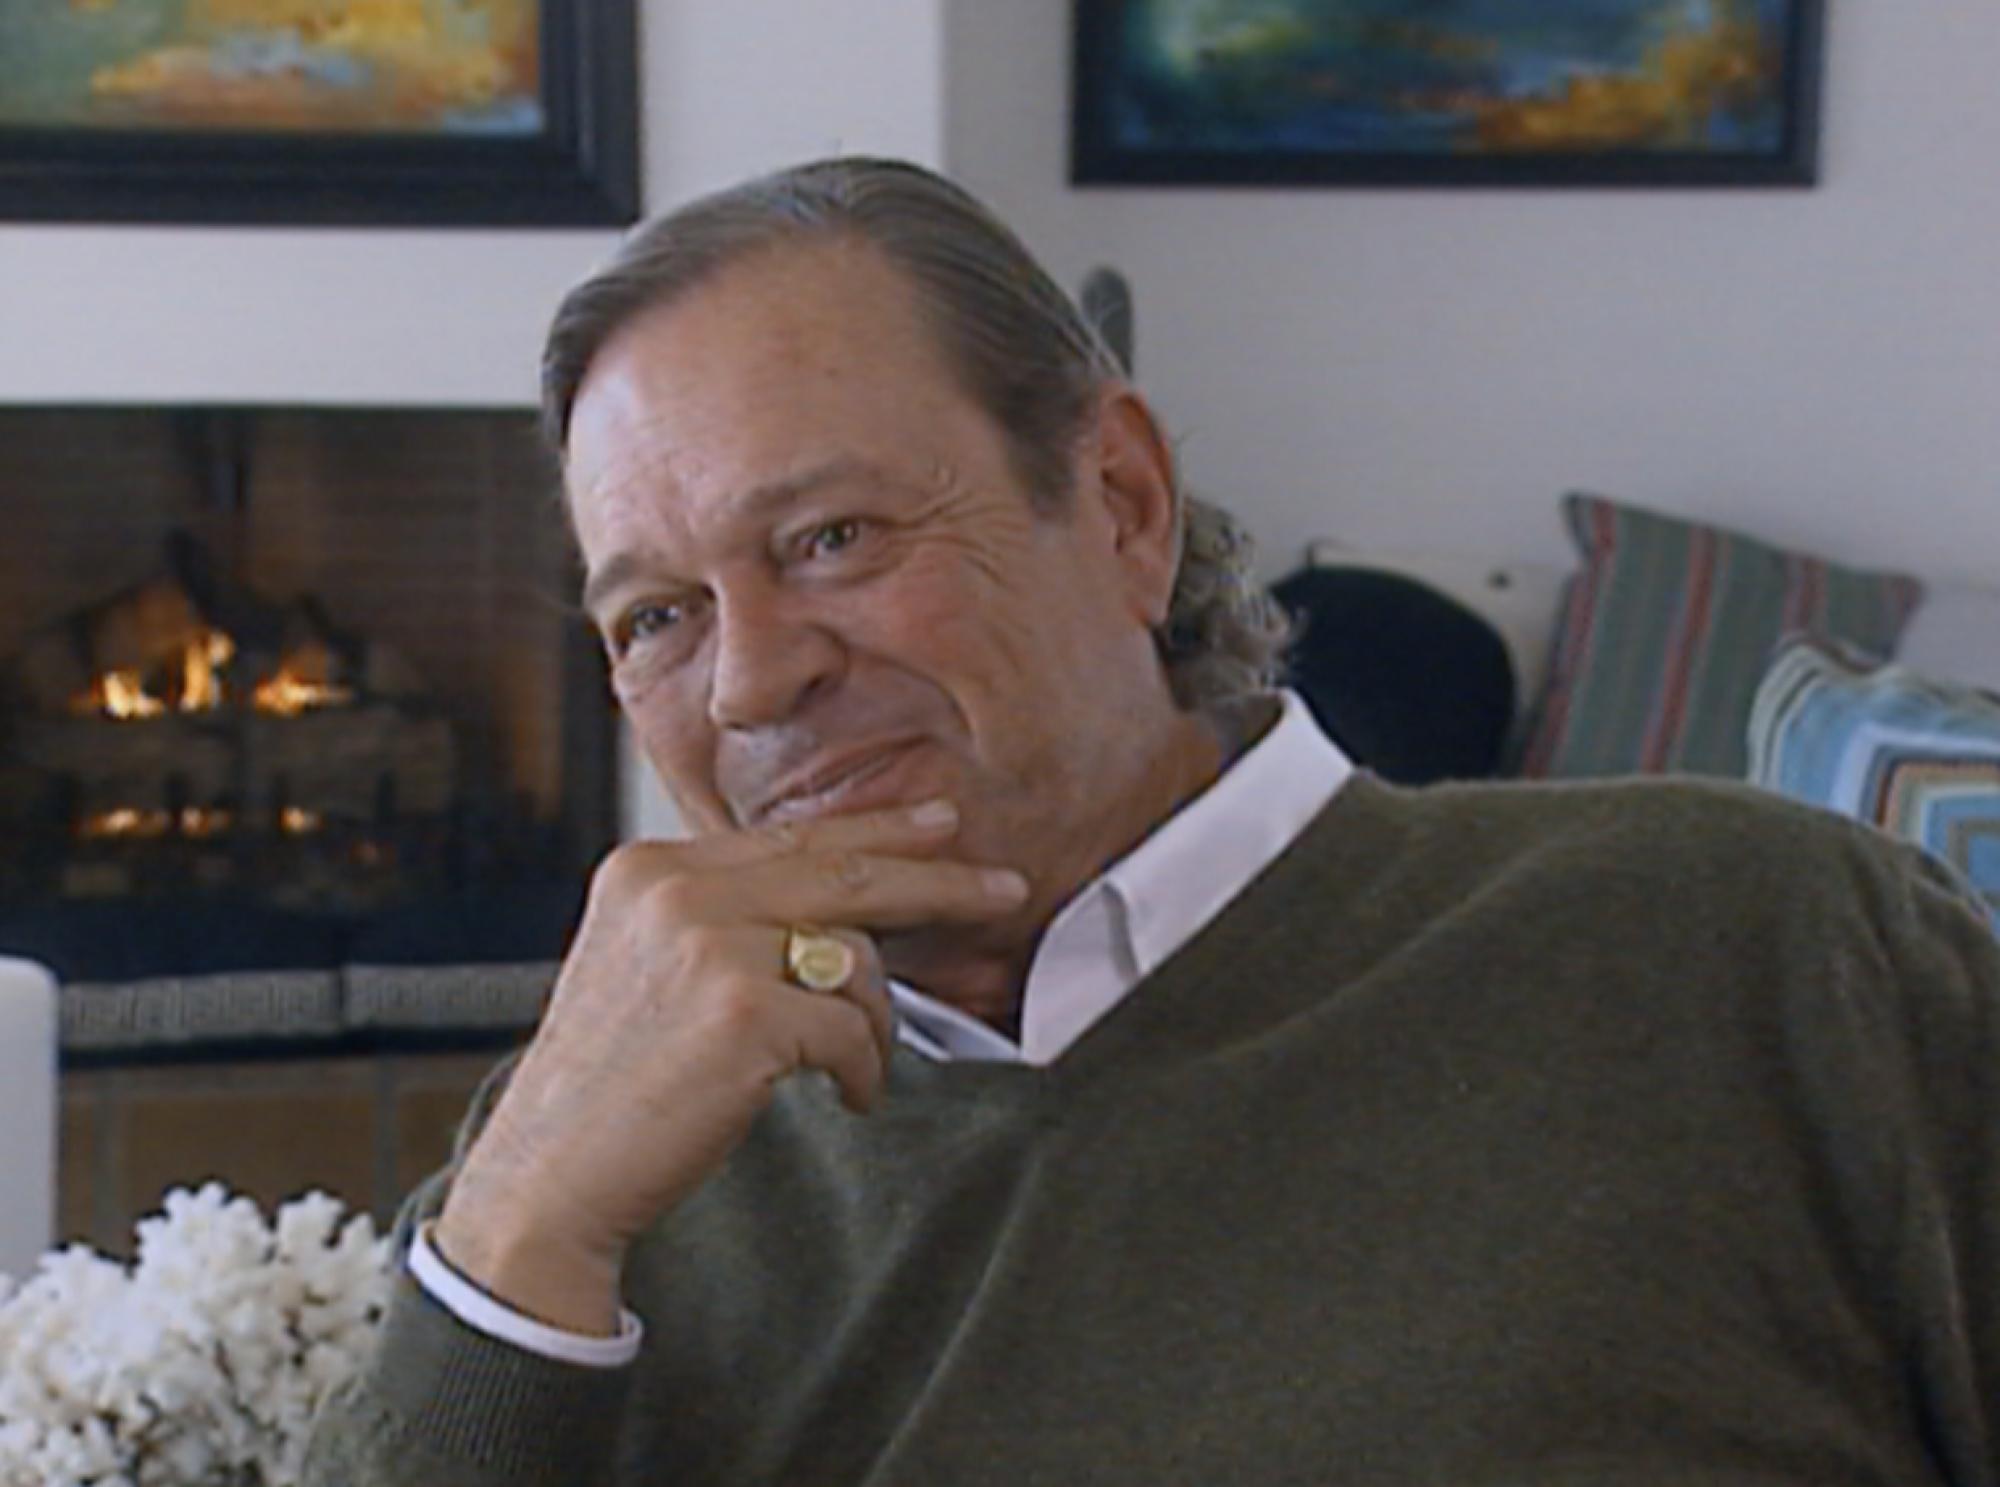 Don Ohlmeyer